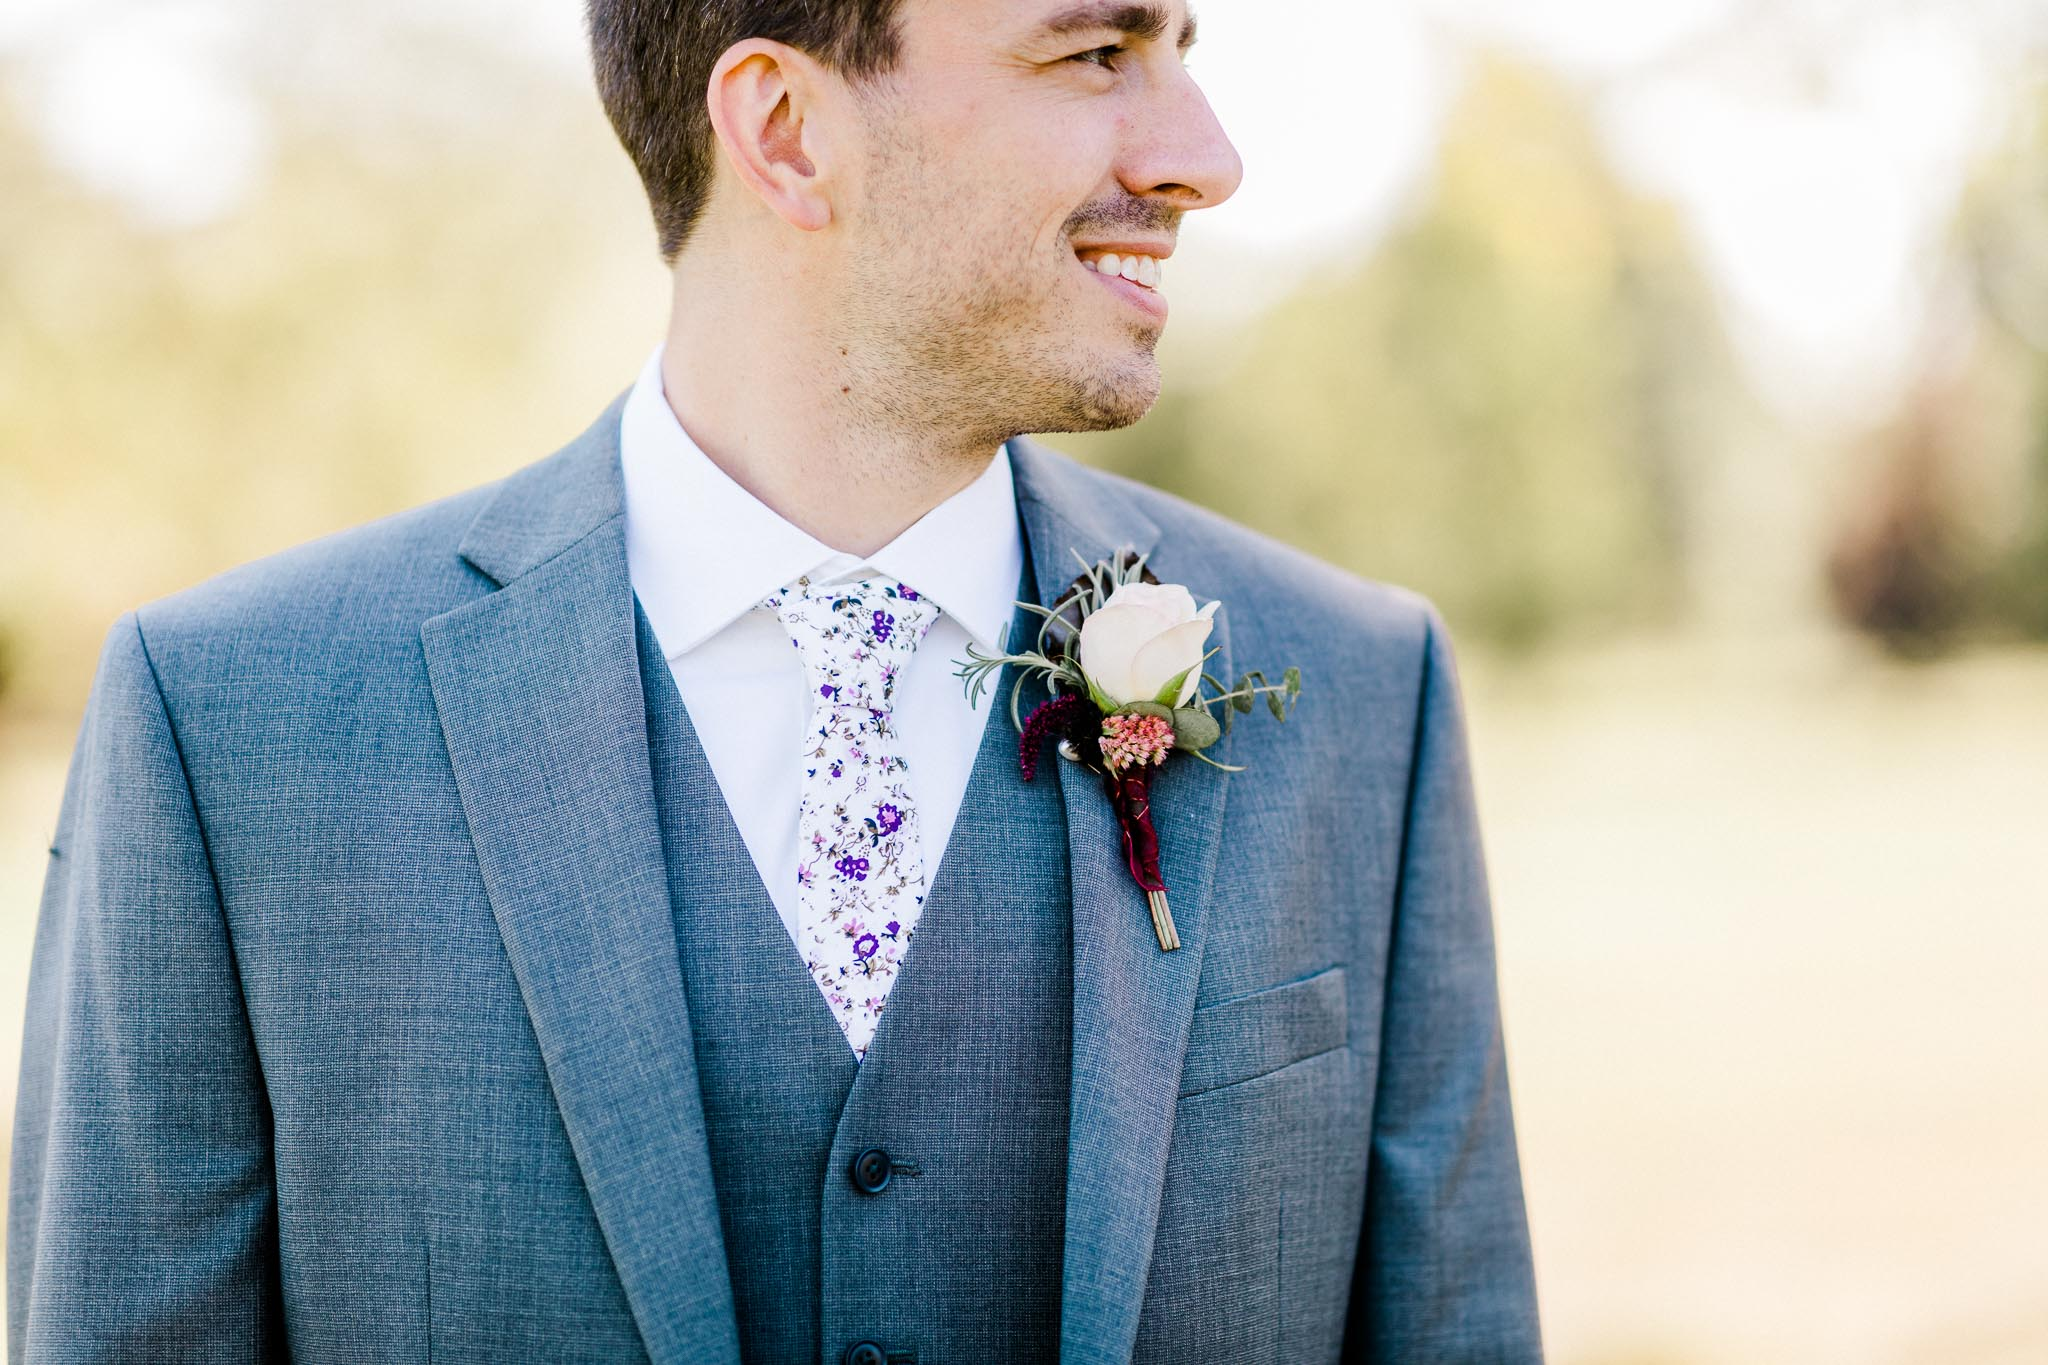 Frosty-Valley-September-Wedding-7521.jpg